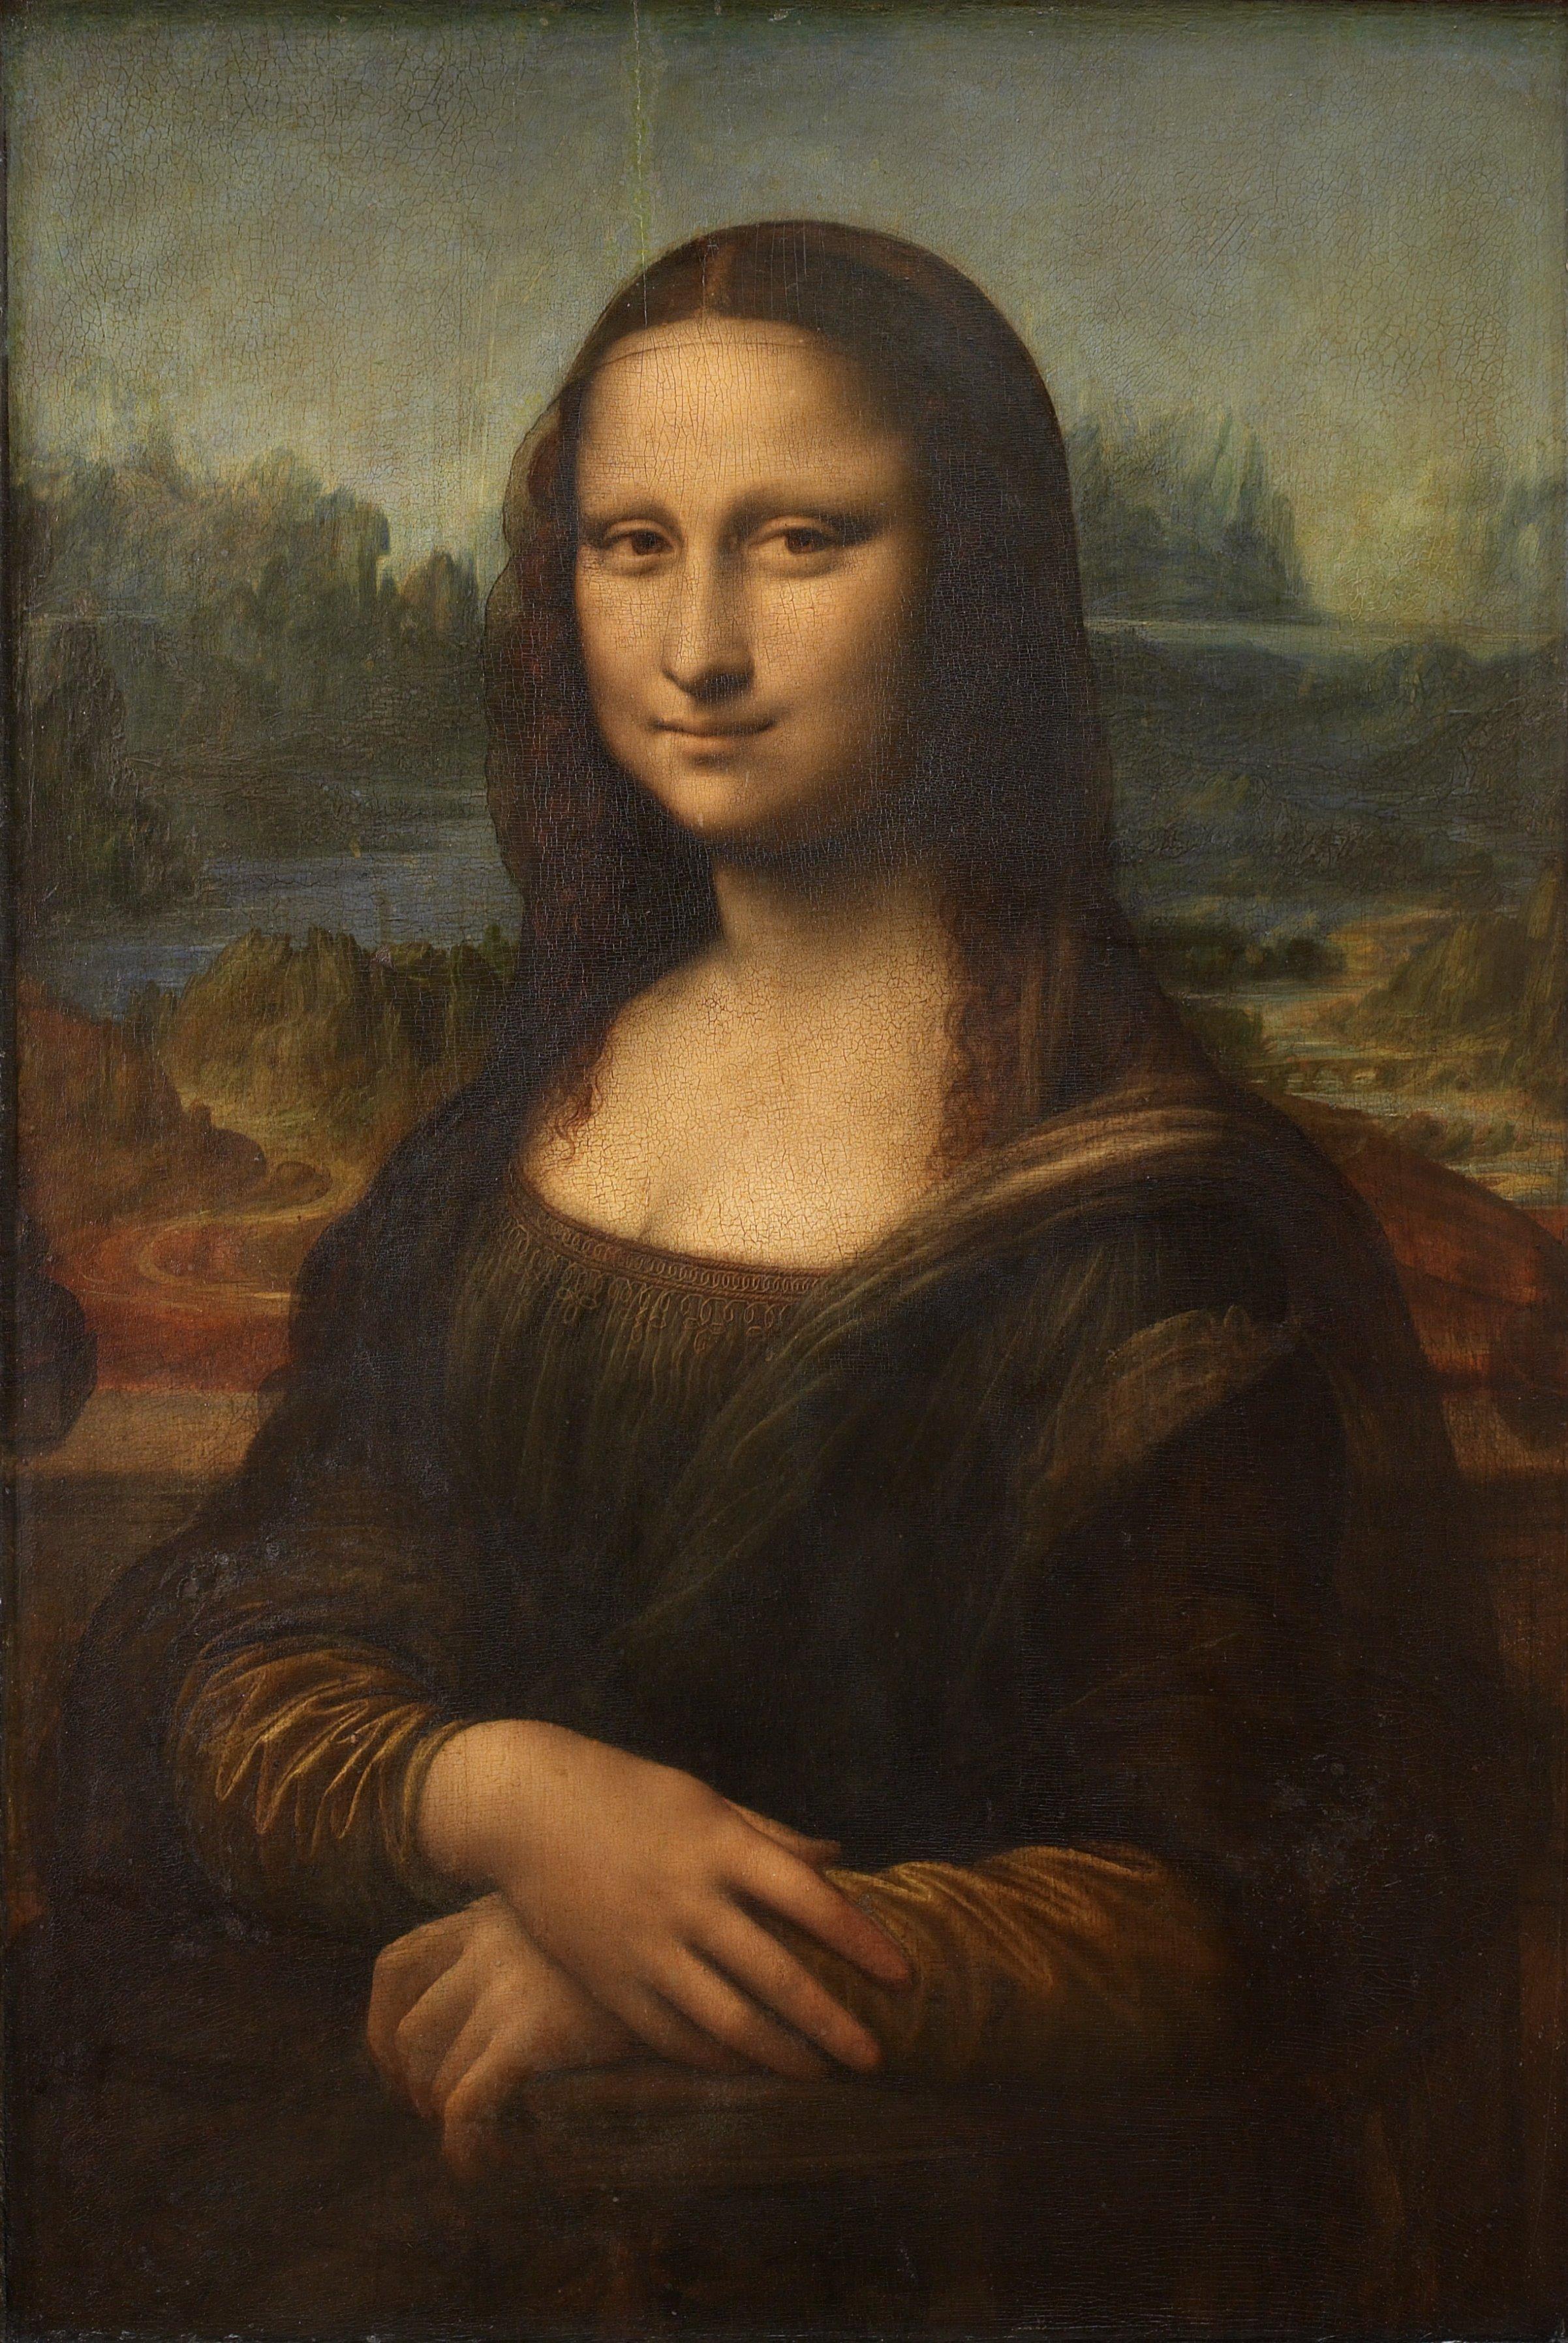 Leonardo_da_Vinci_-_Mona_Lisa